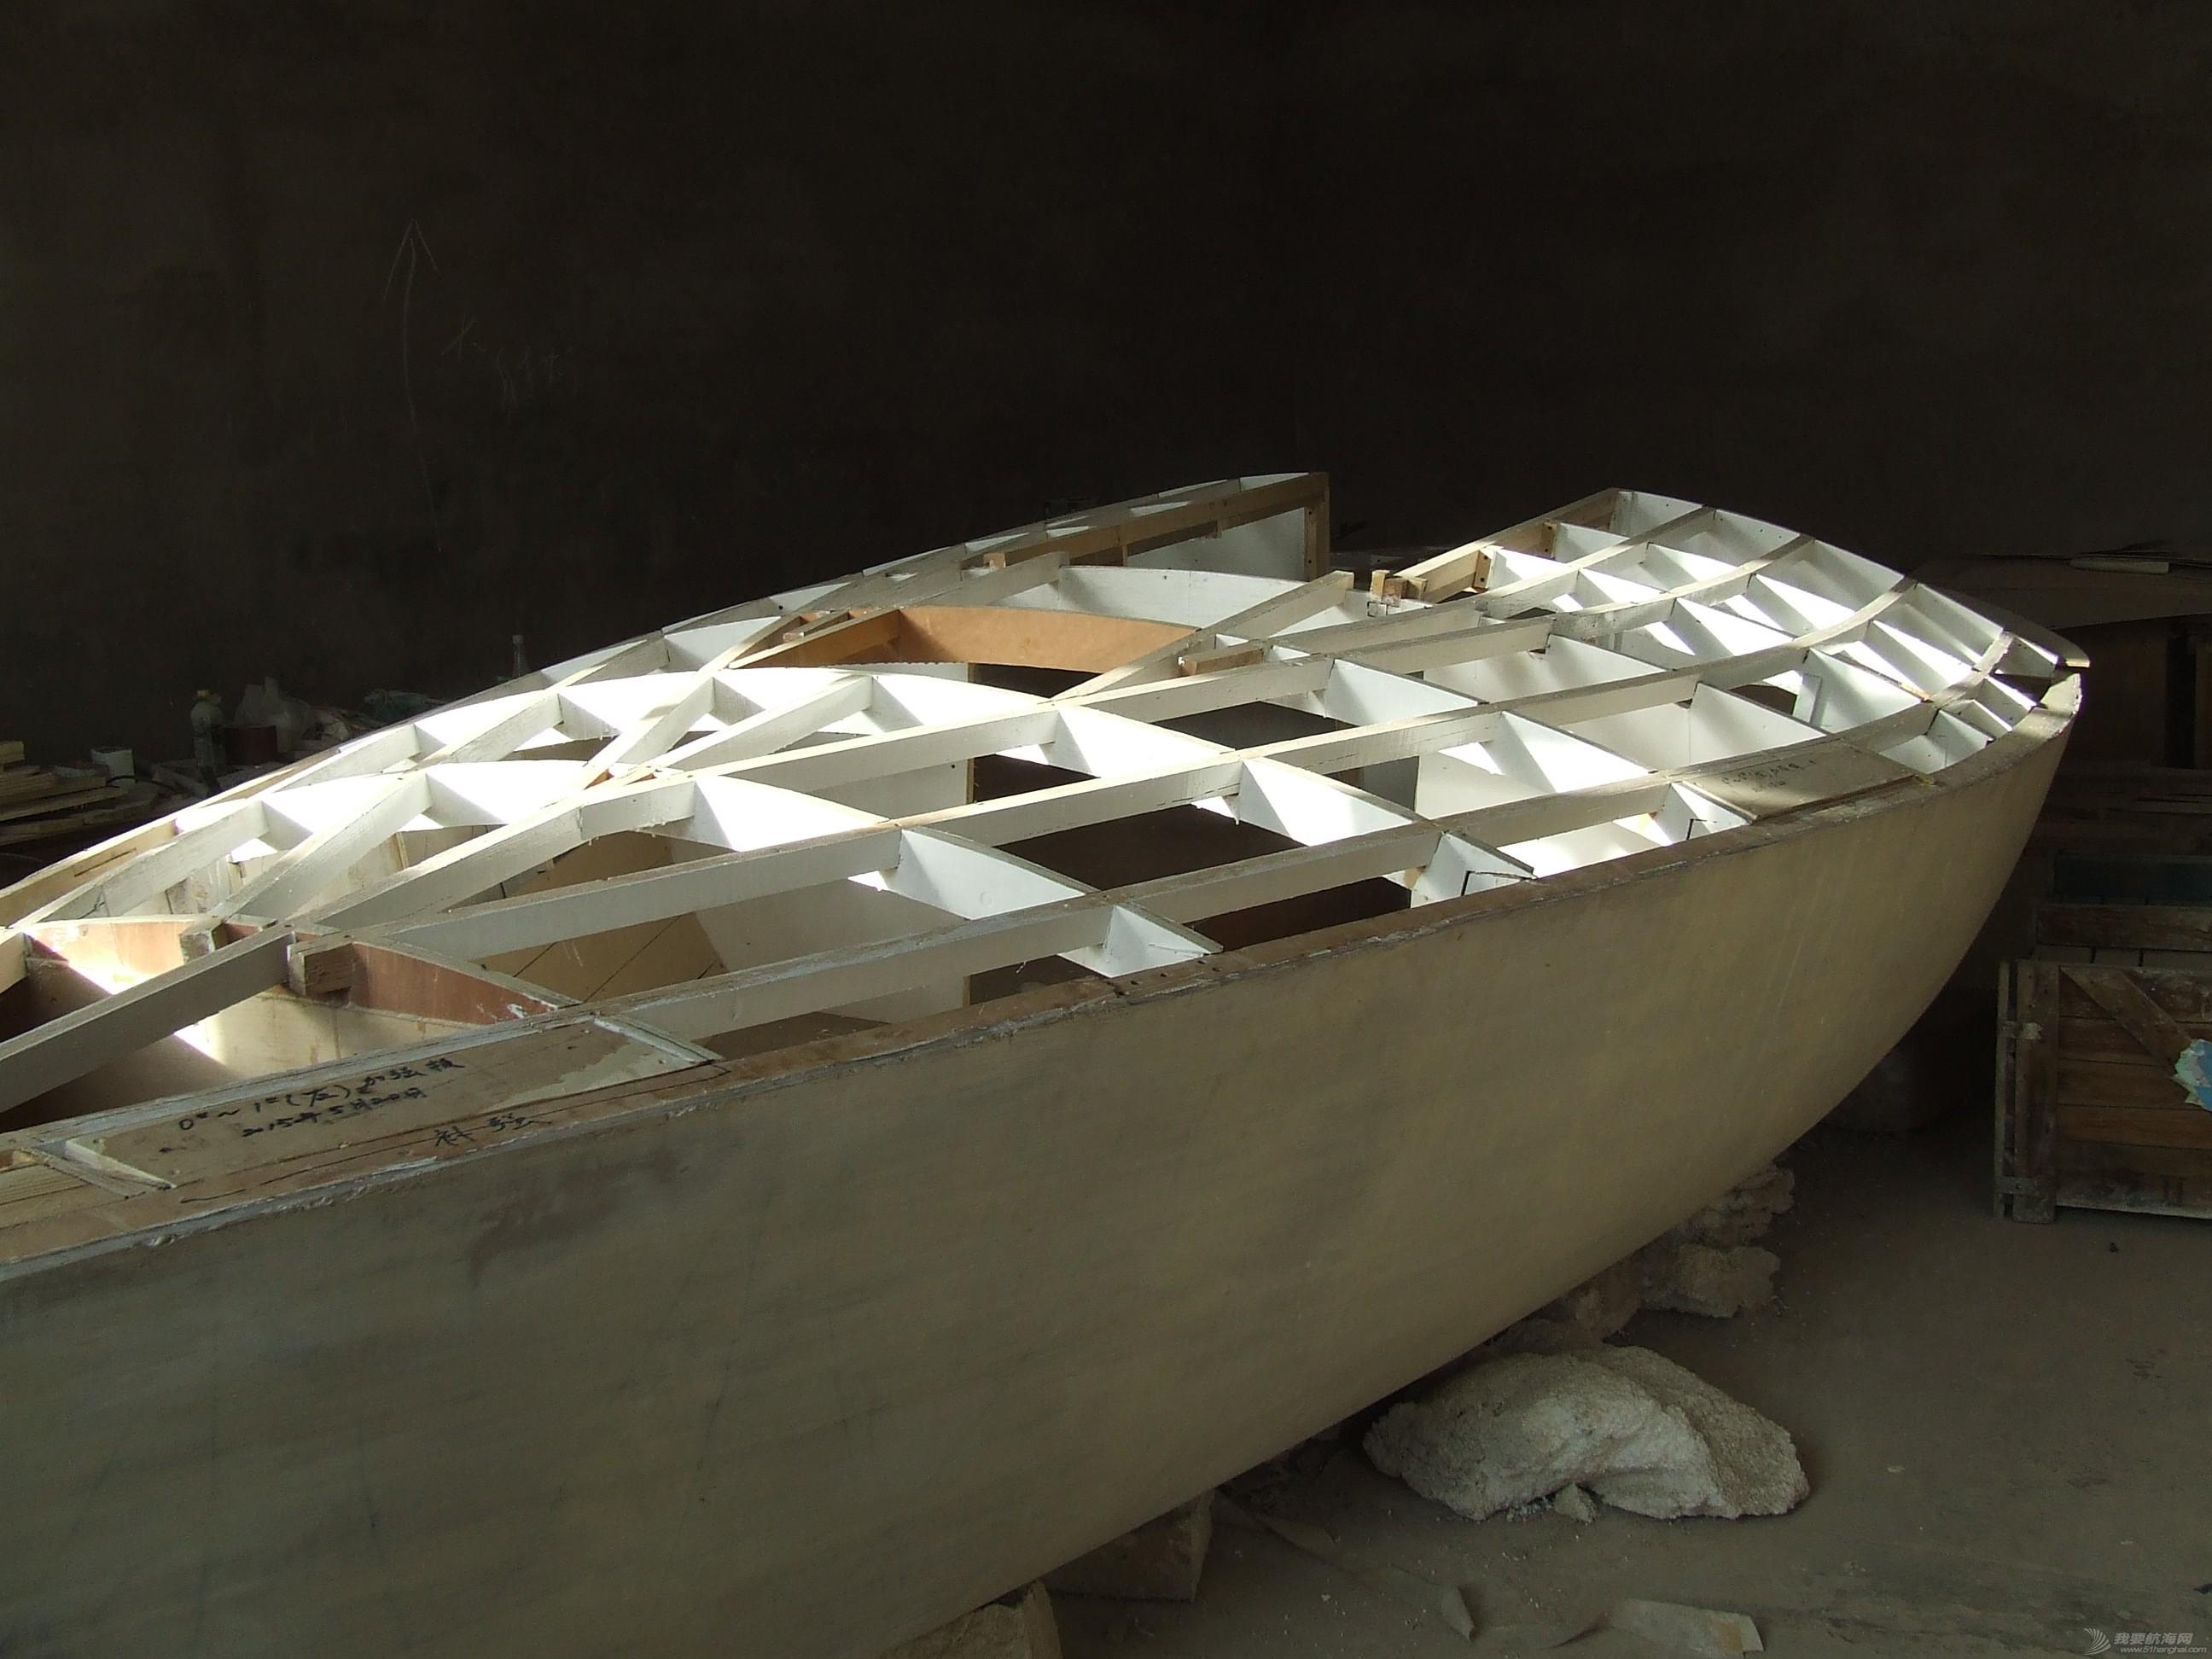 GR-750舱面面板铺装完毕 DSCF5936.JPG